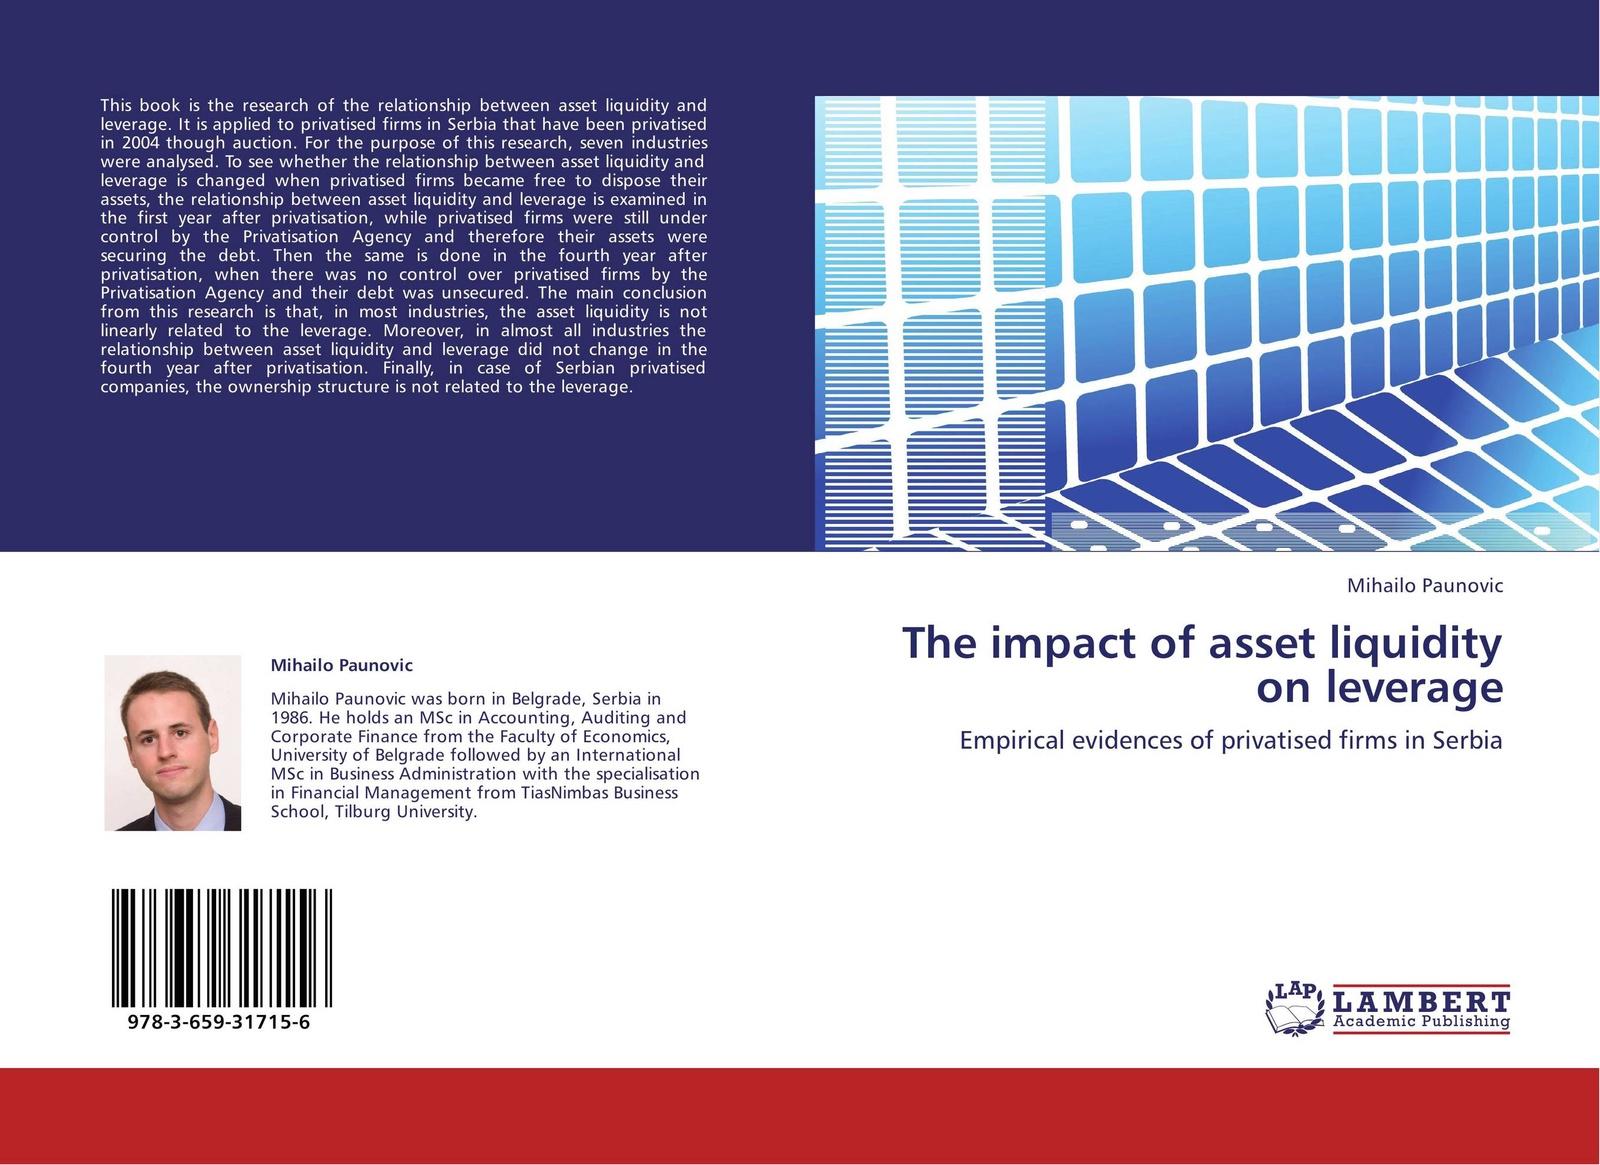 Mihailo Paunovic The impact of asset liquidity on leverage цена